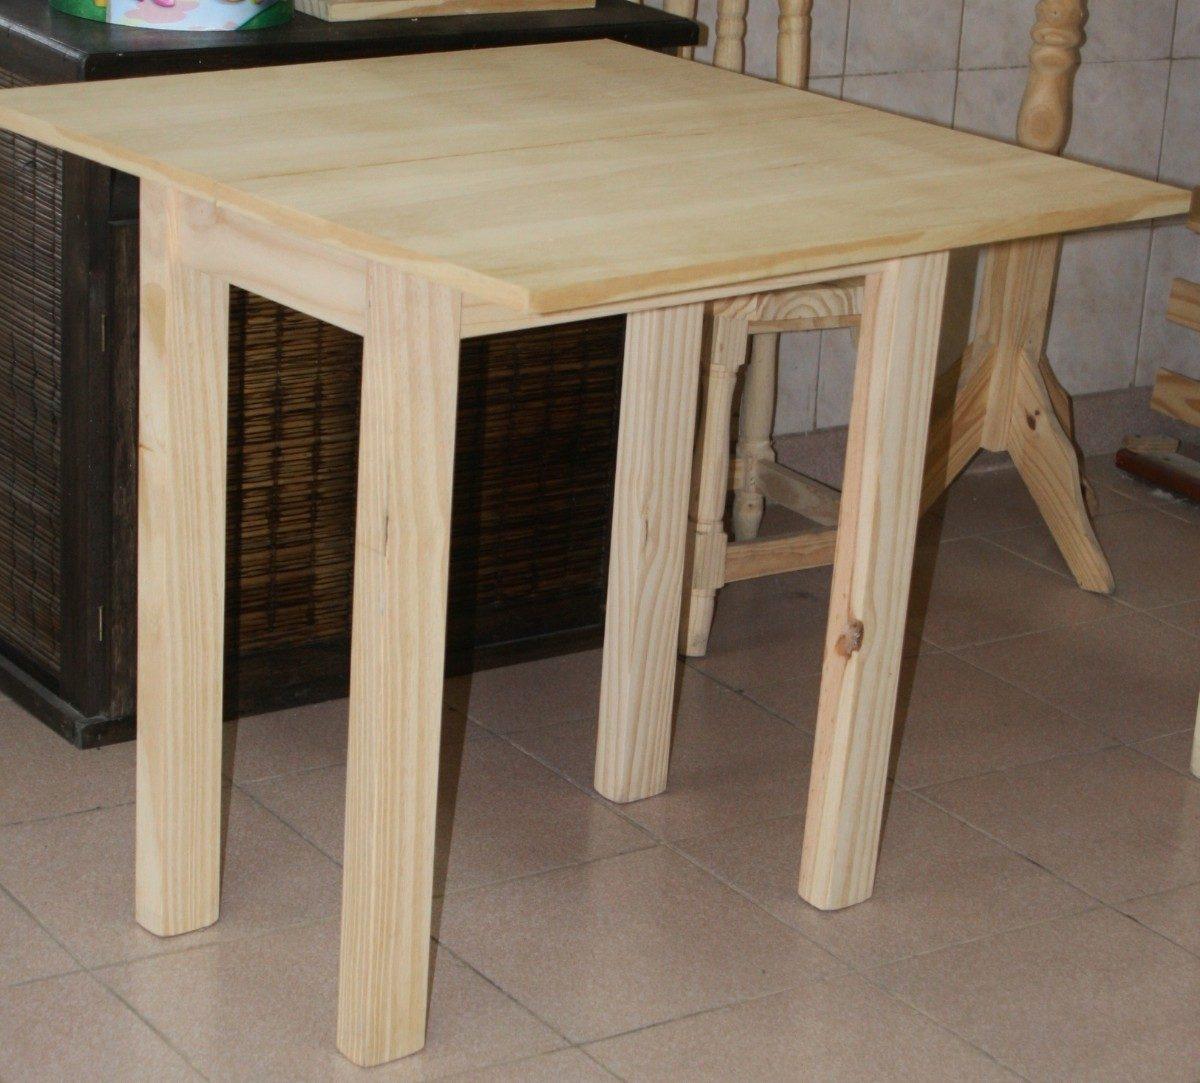 Mesas de comedor plegables tipo libro finest mesa libro - Mesa cocina plegable tipo libro ...